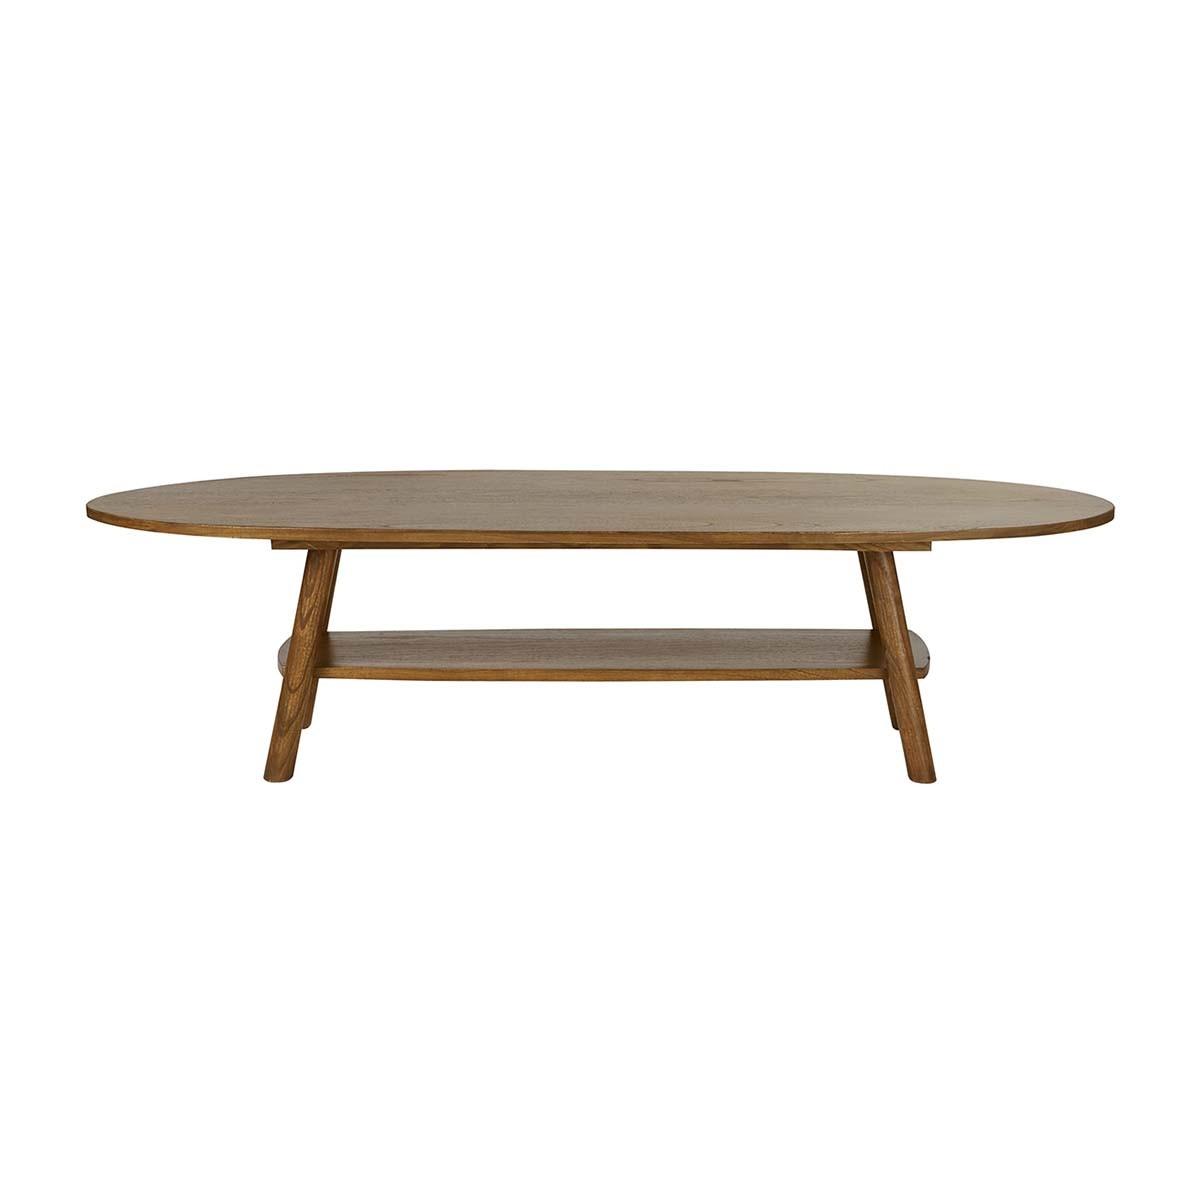 Table basse double plateau finition noyer